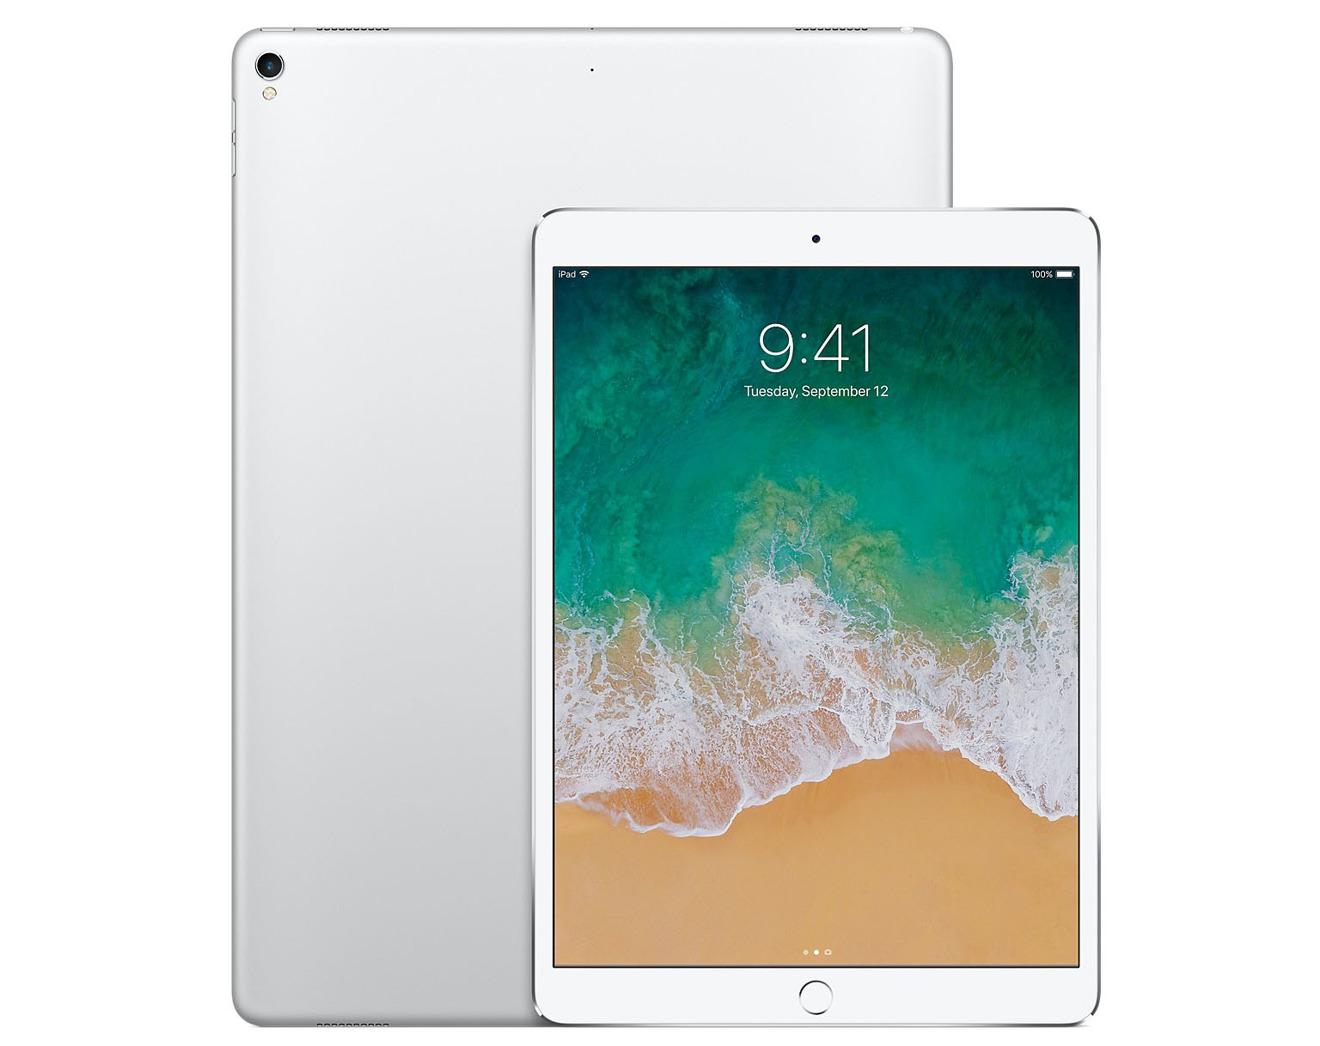 Apple iPad Pro in Silver